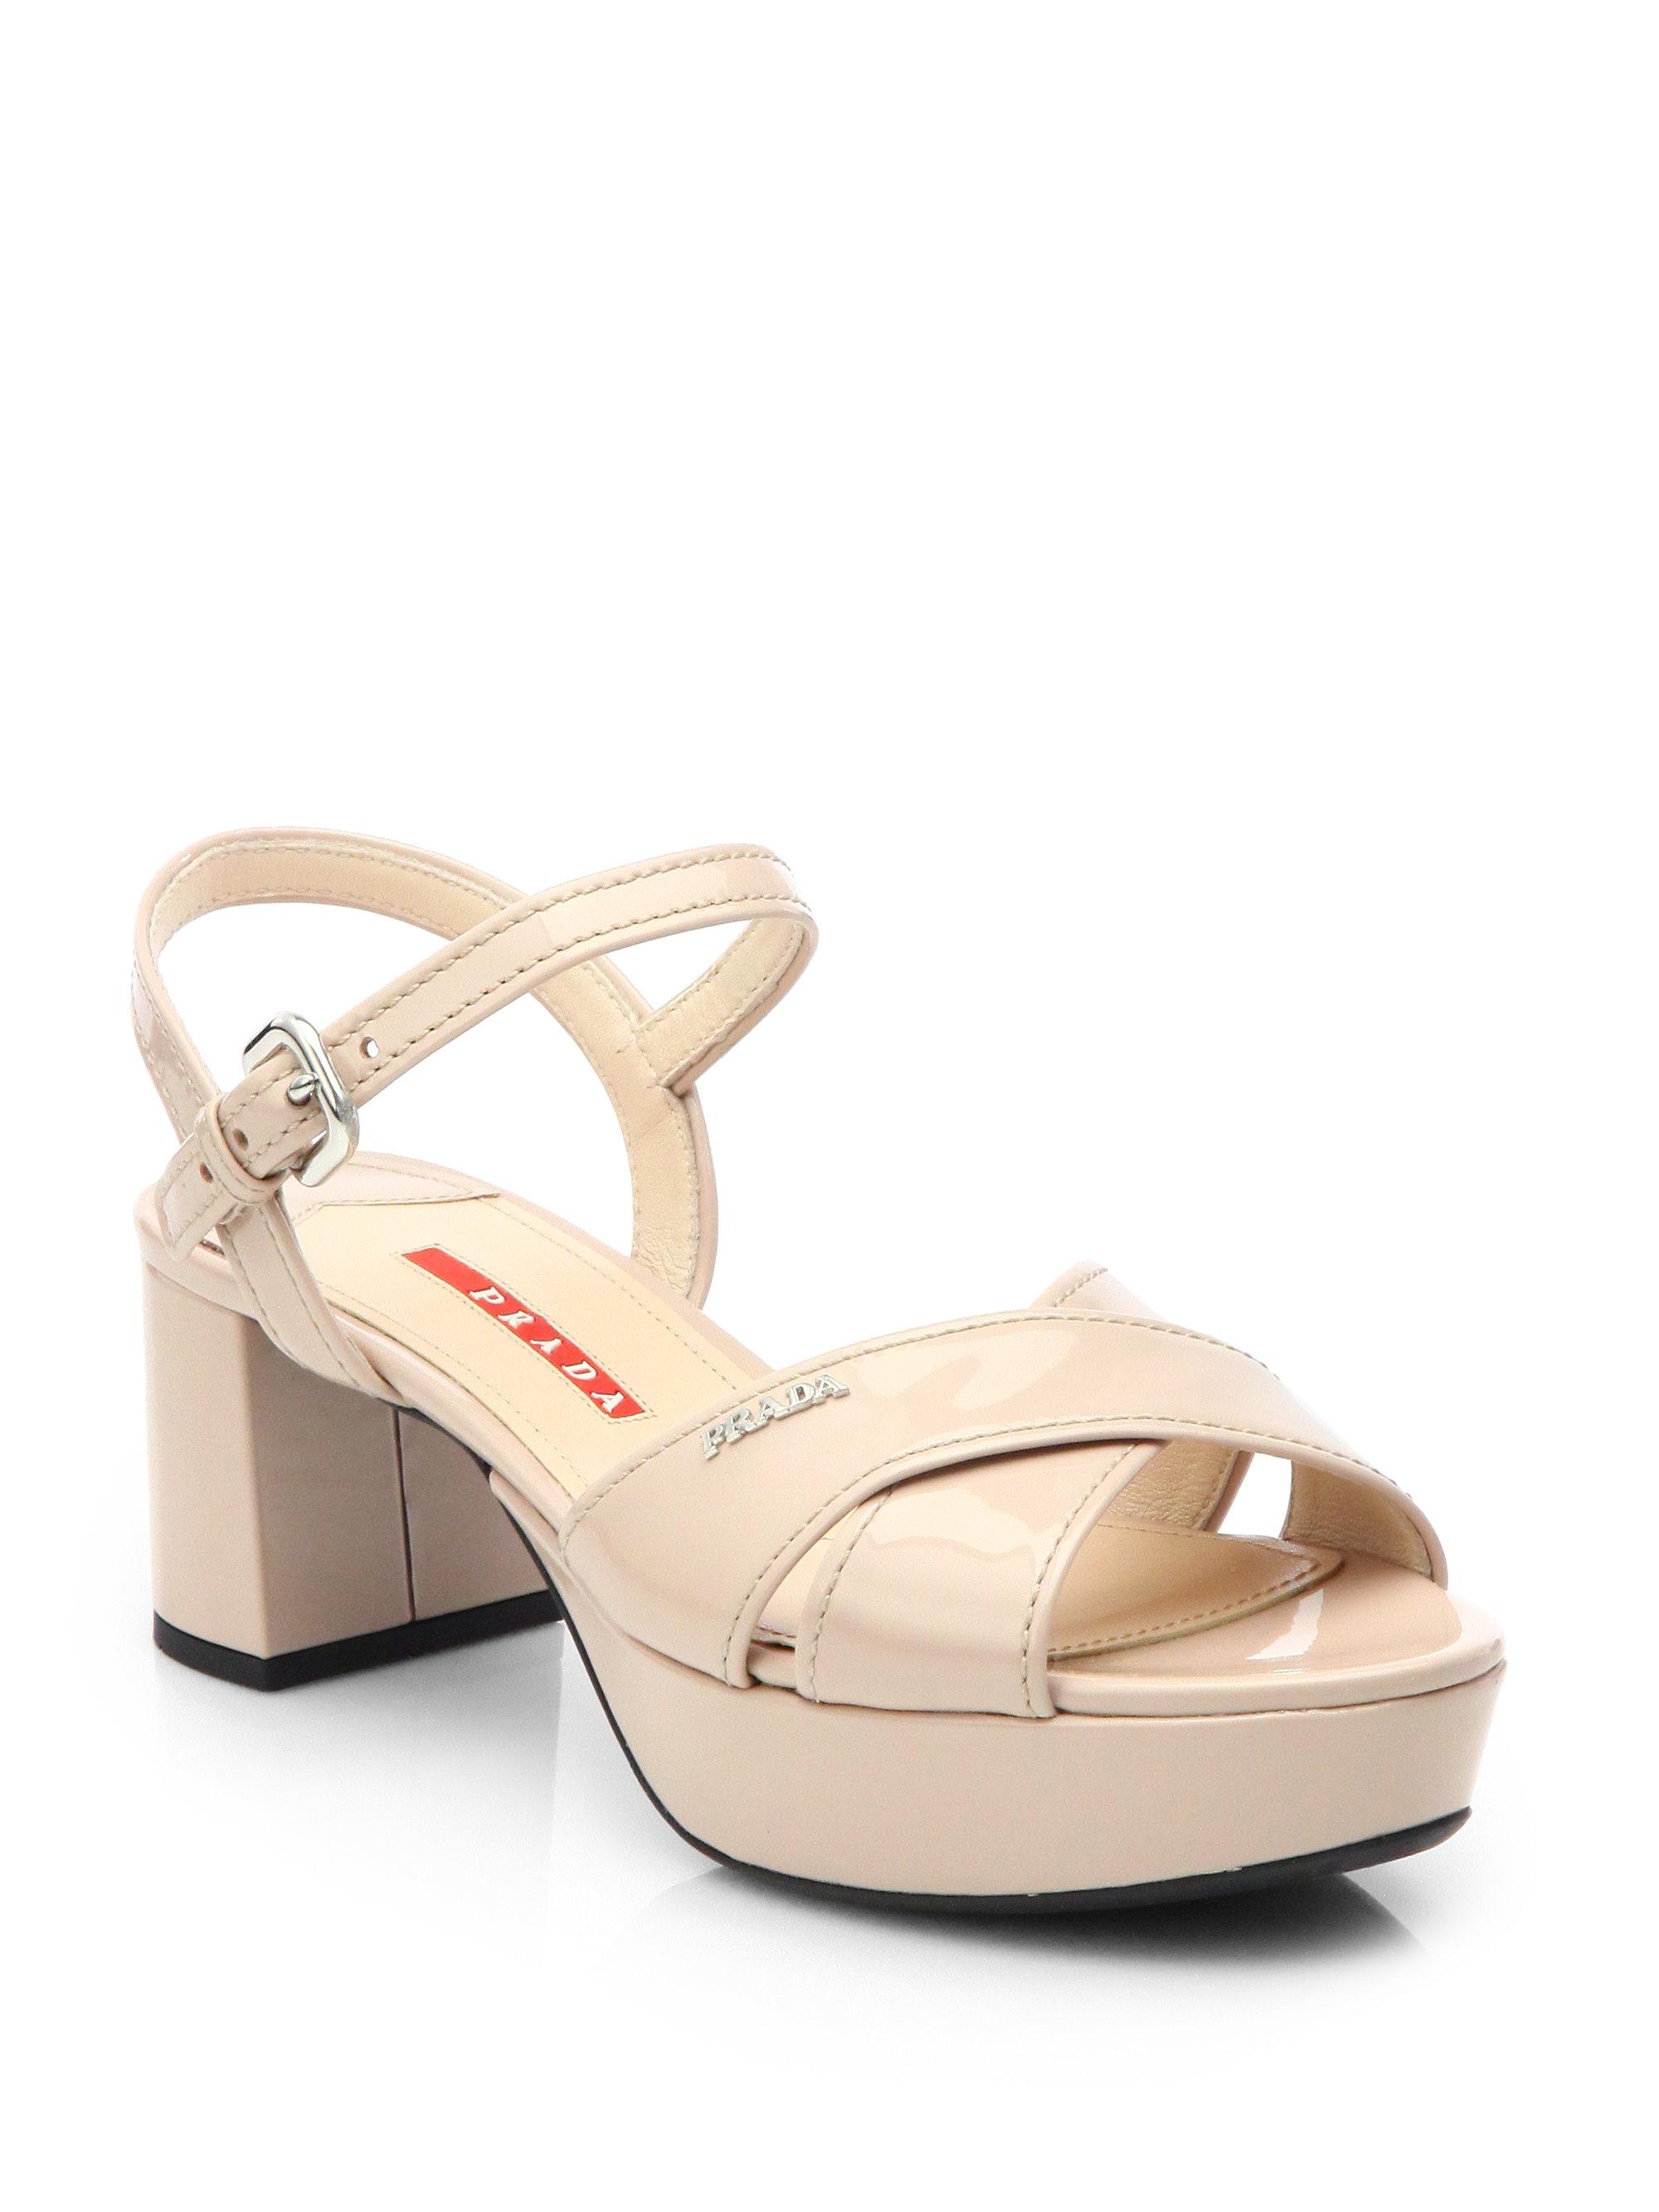 80cda9bba2a Lyst - Prada Patent Leather Crisscross Platform Sandals in Natural